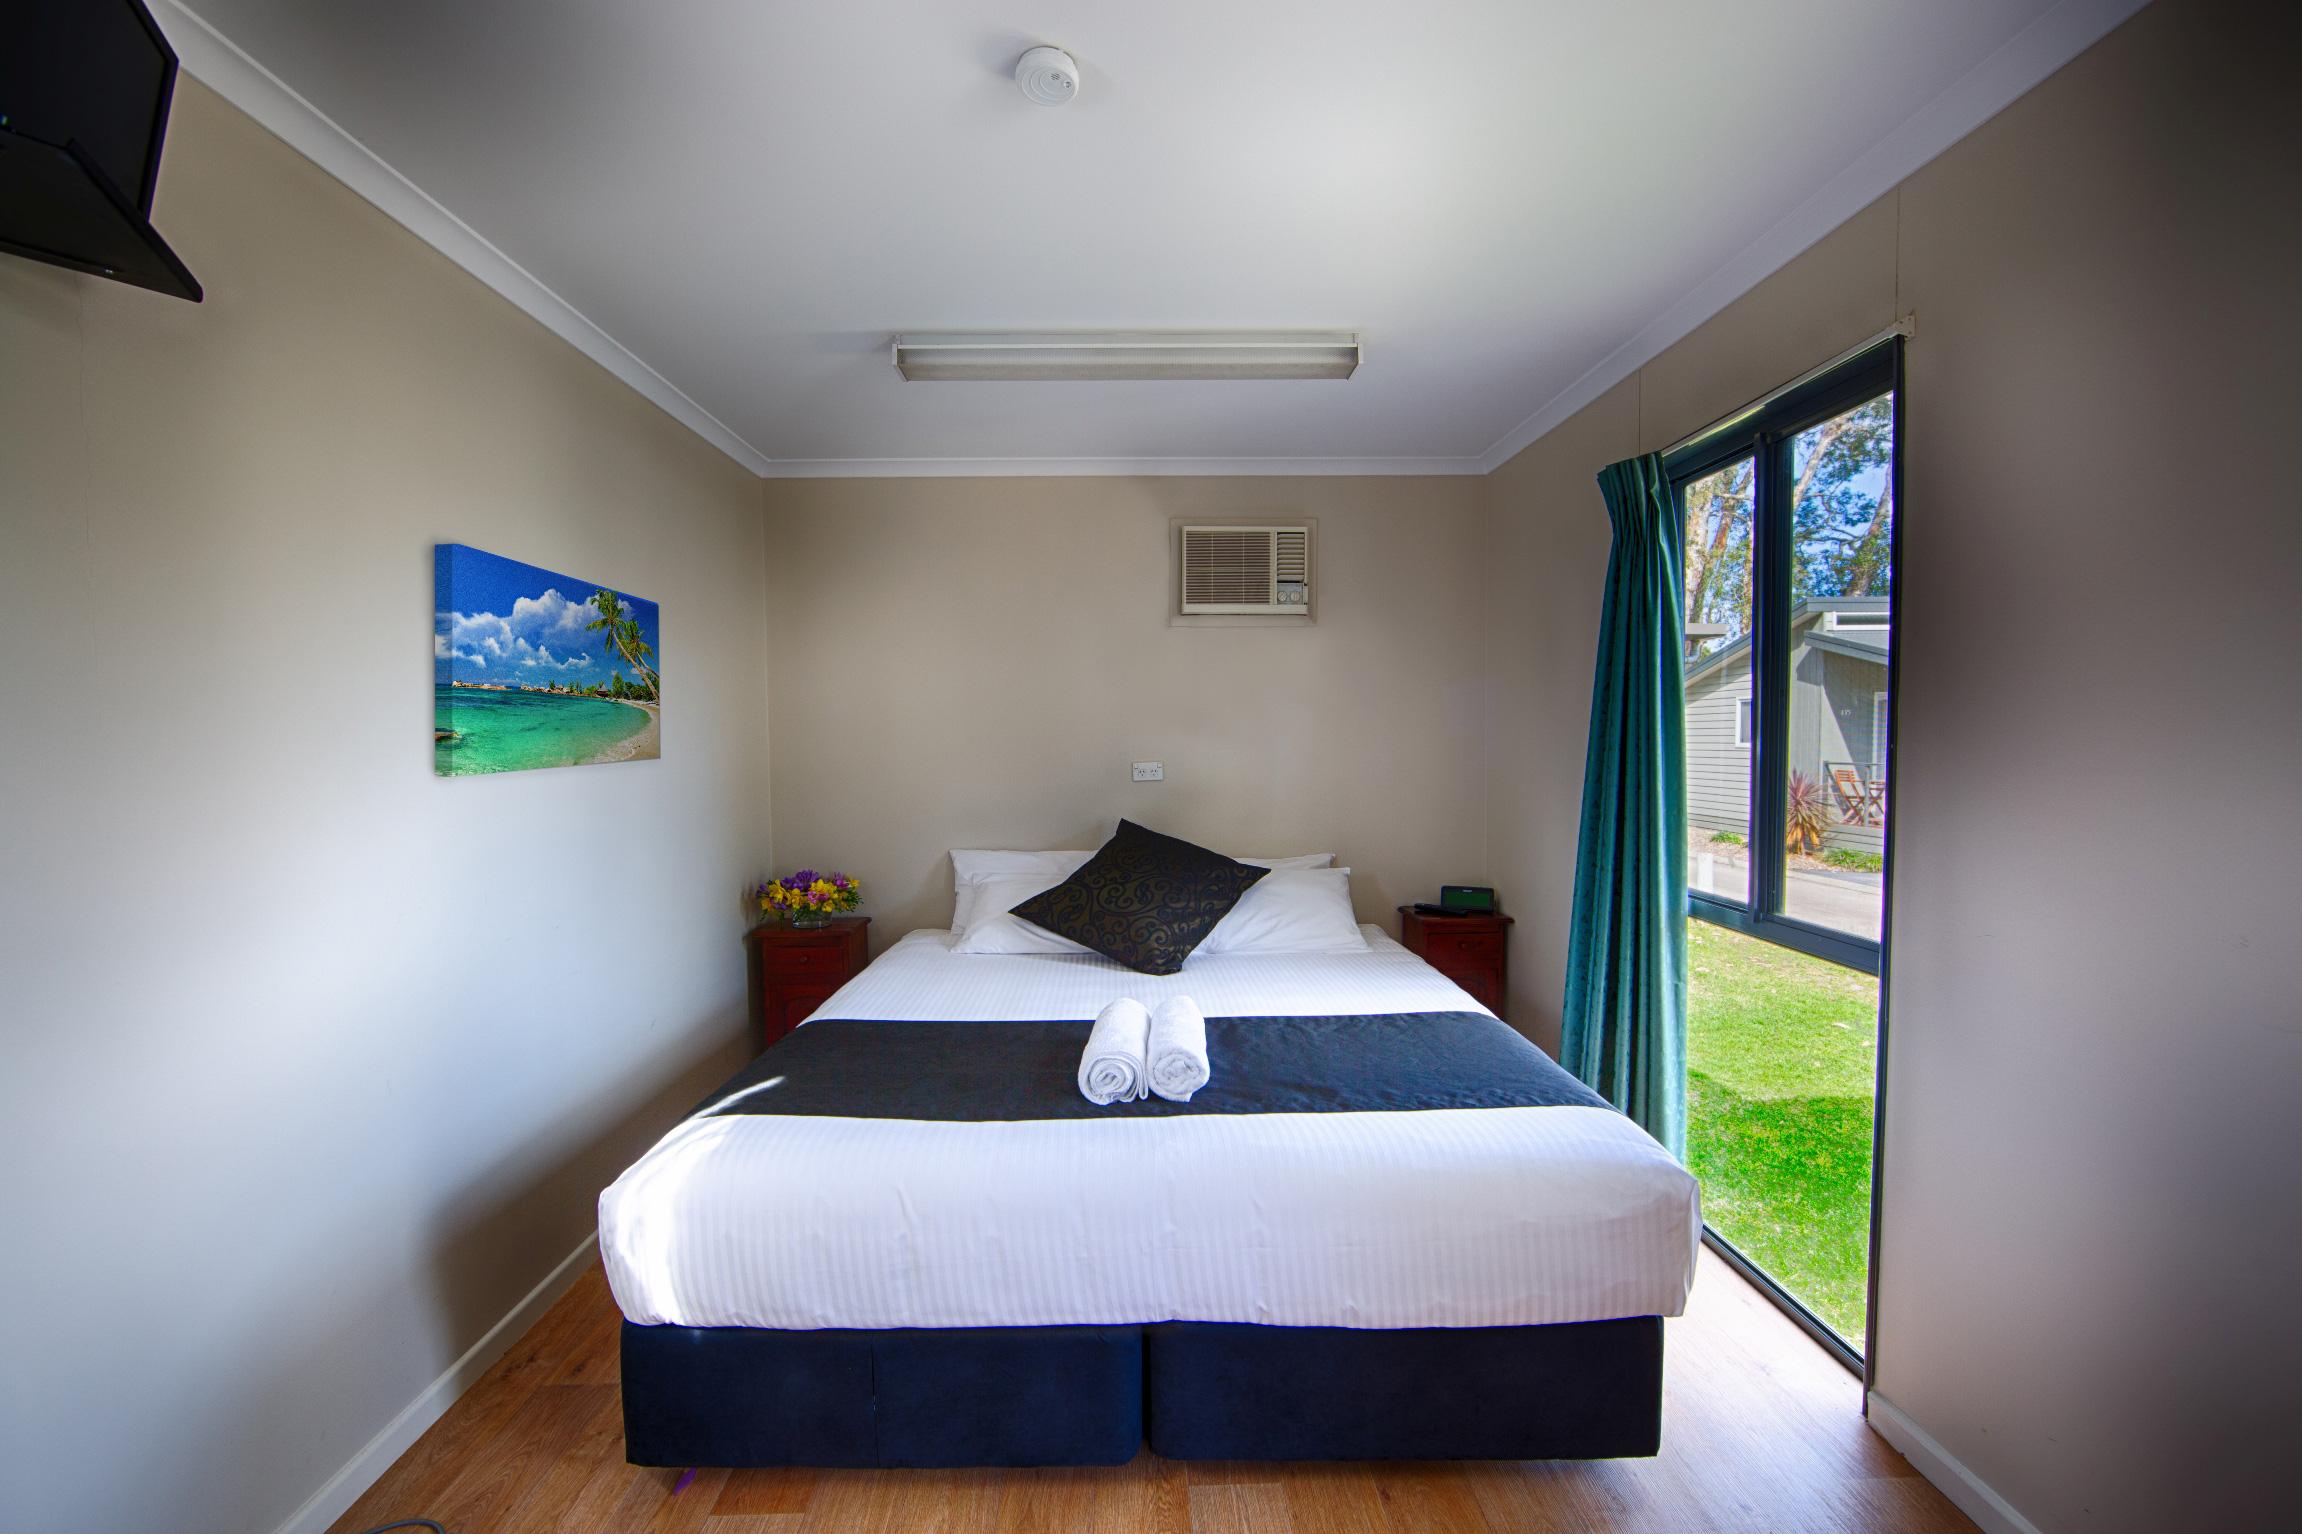 Motel-room-bed-Pic-2.jpg